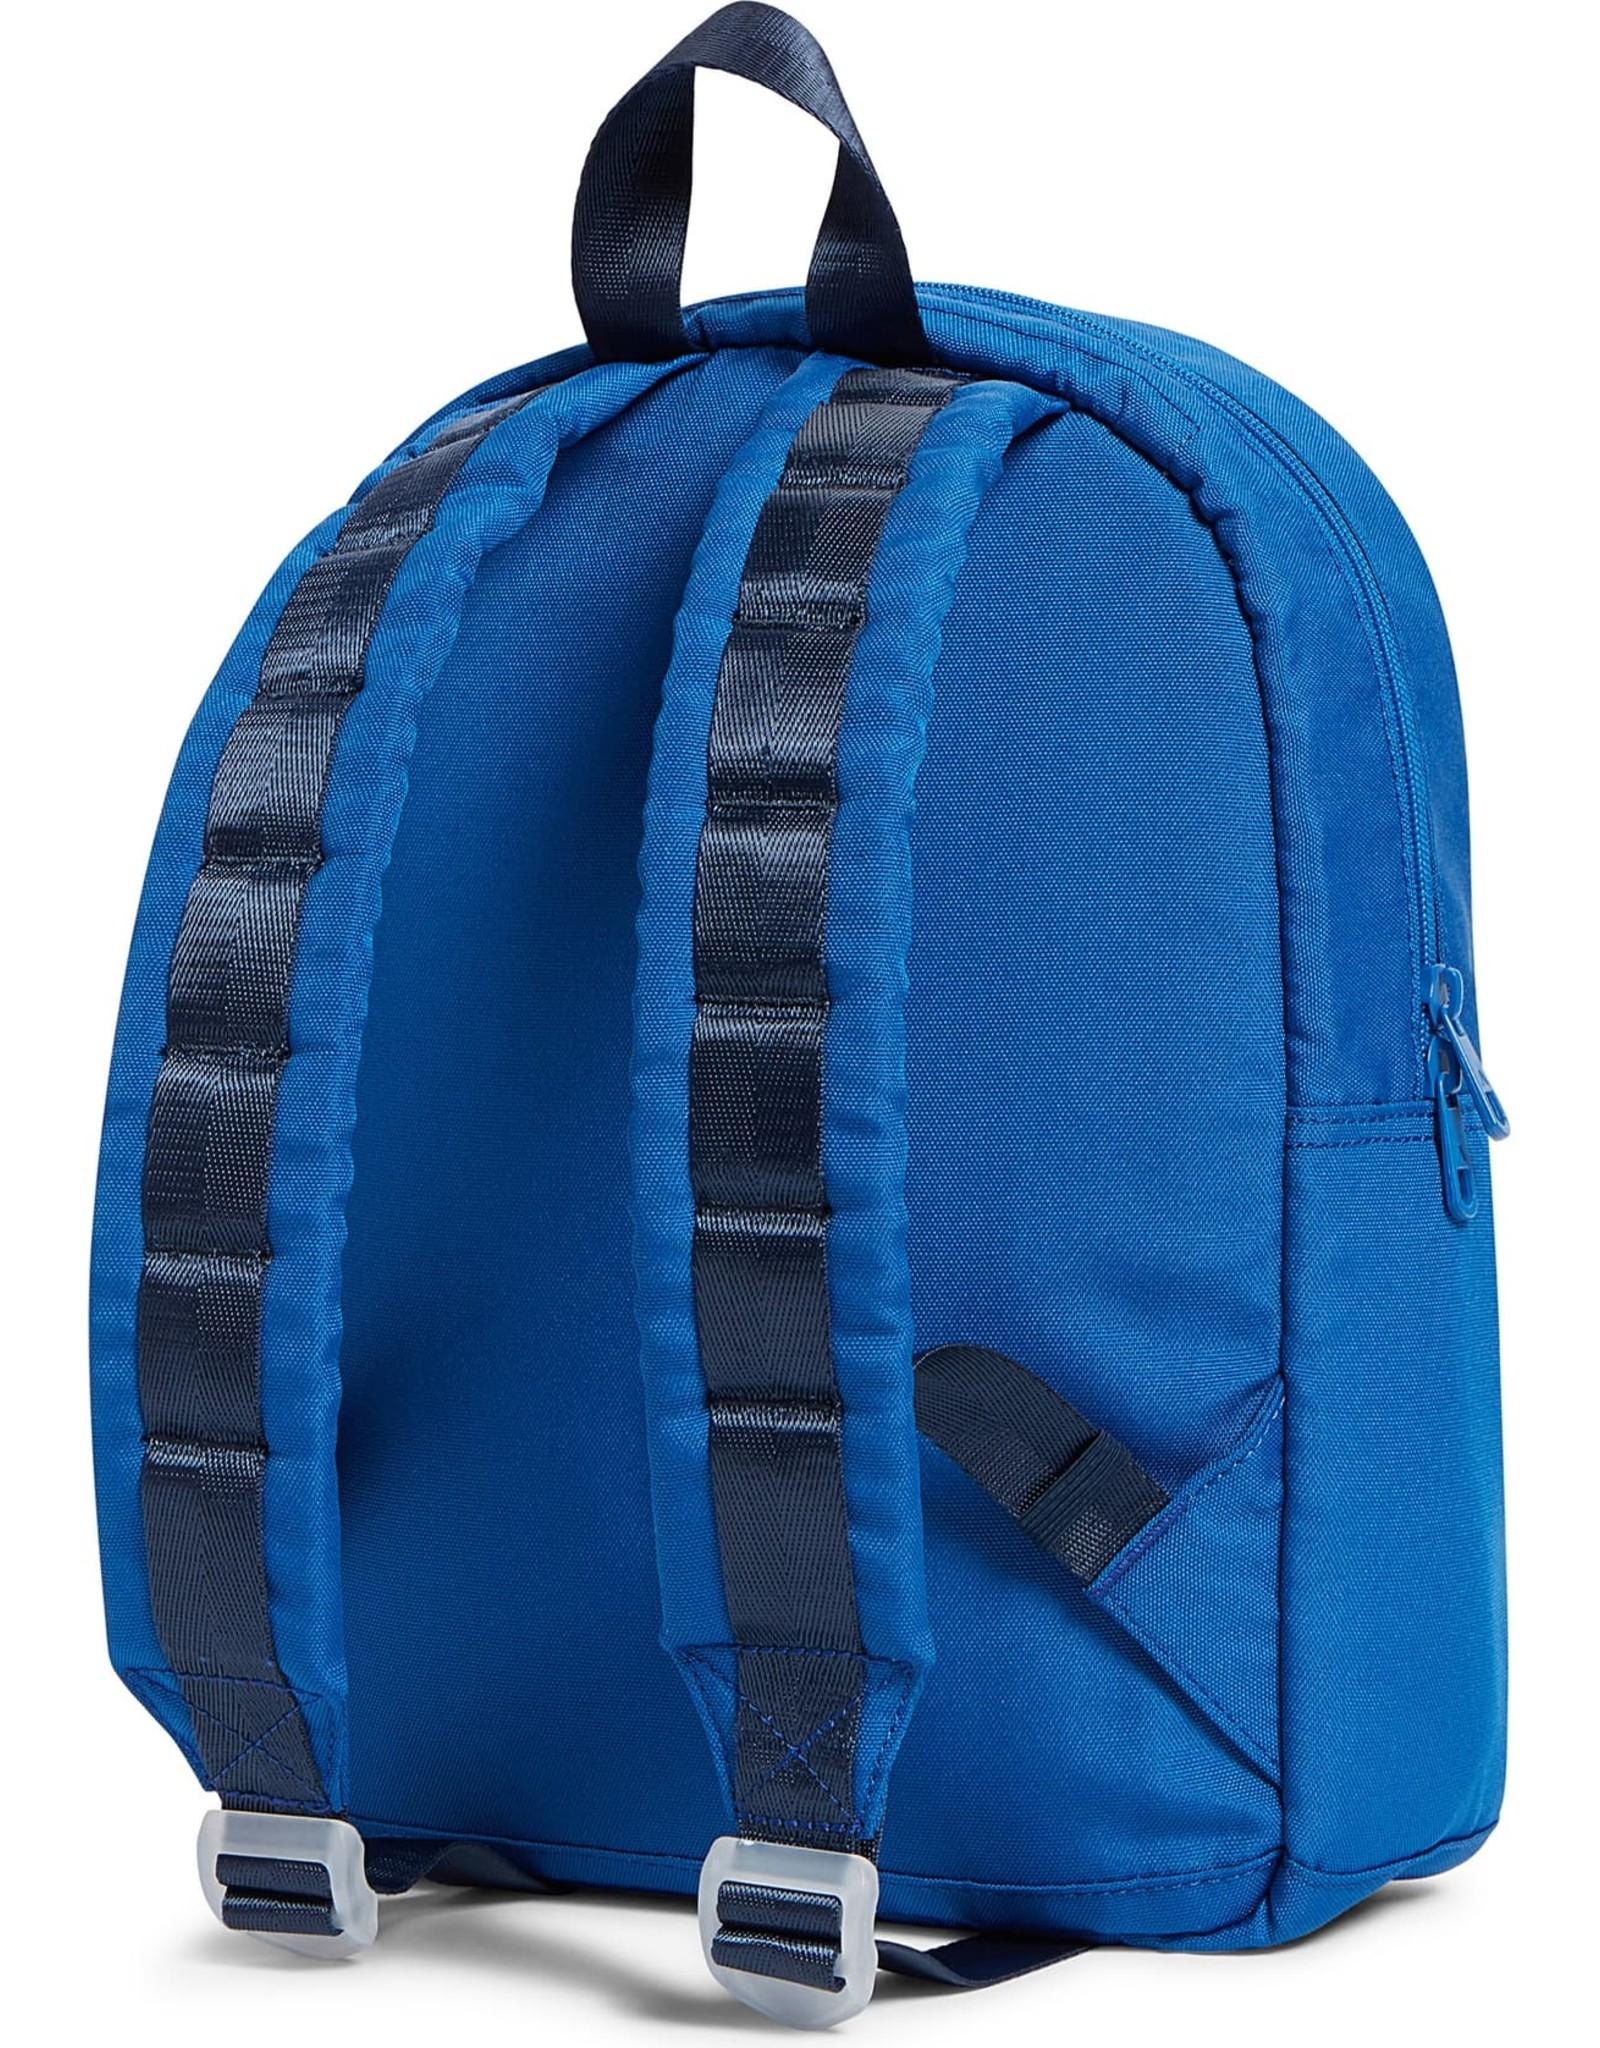 State Bags kane coated- camo